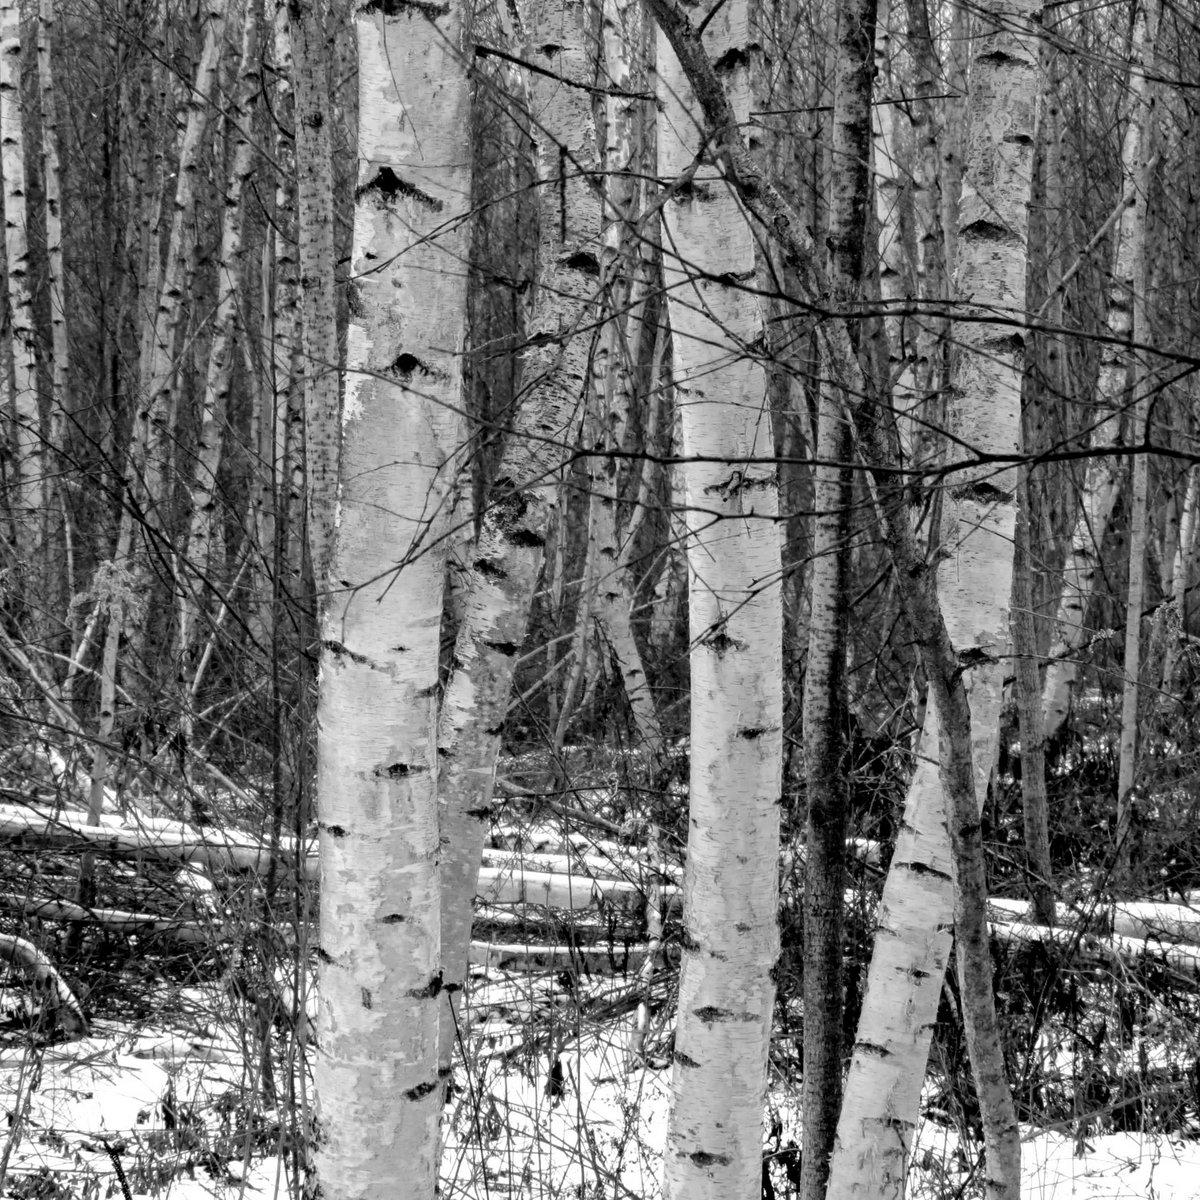 11. Gray Birches in Winter